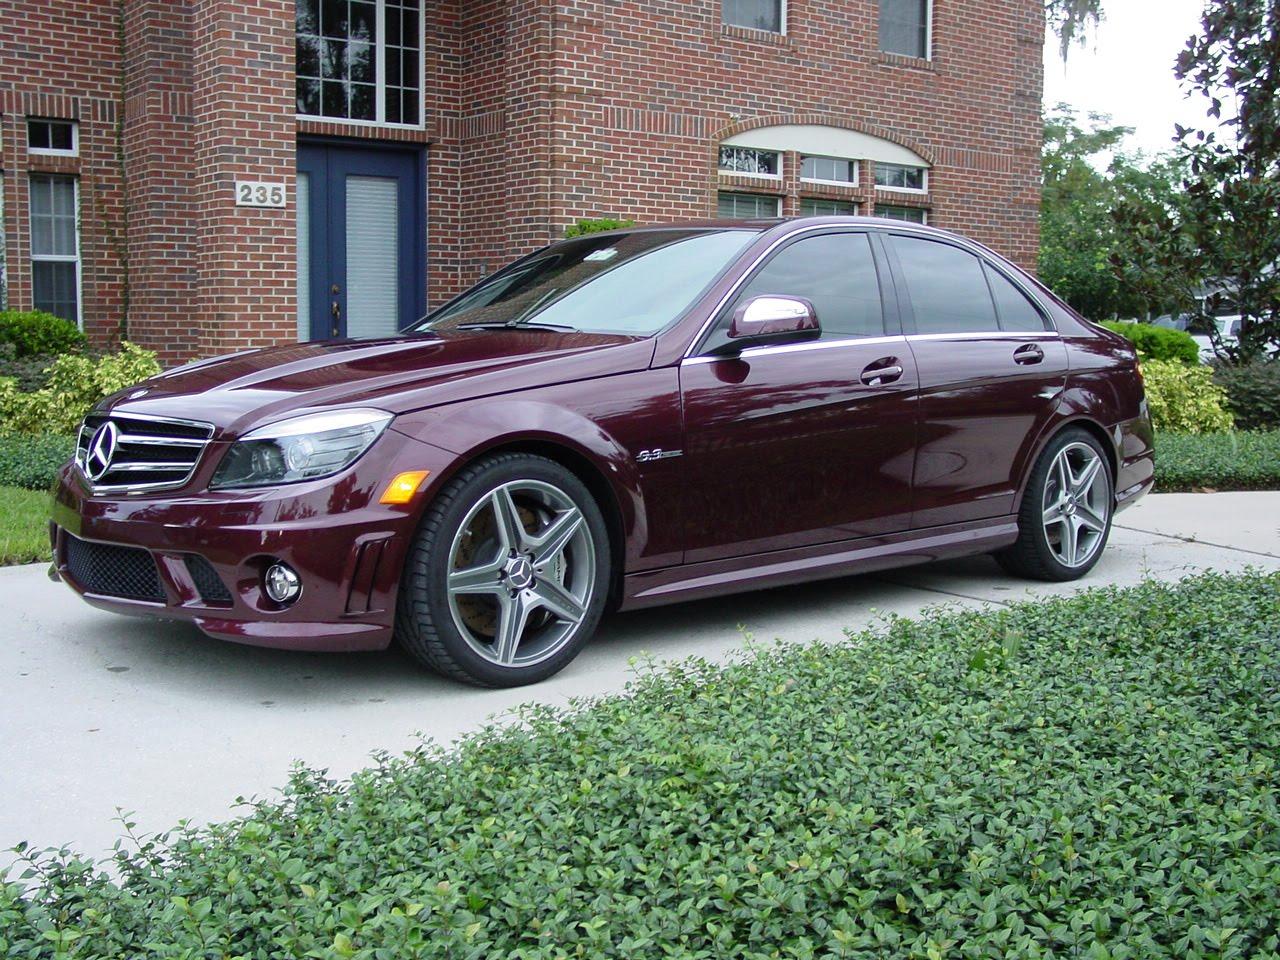 http://1.bp.blogspot.com/-RXlghnYbnFQ/TaFjW80WISI/AAAAAAAAAxM/W1WC-PUBcYk/s1600/Mercedes-Benz-C63-AMG.jpg